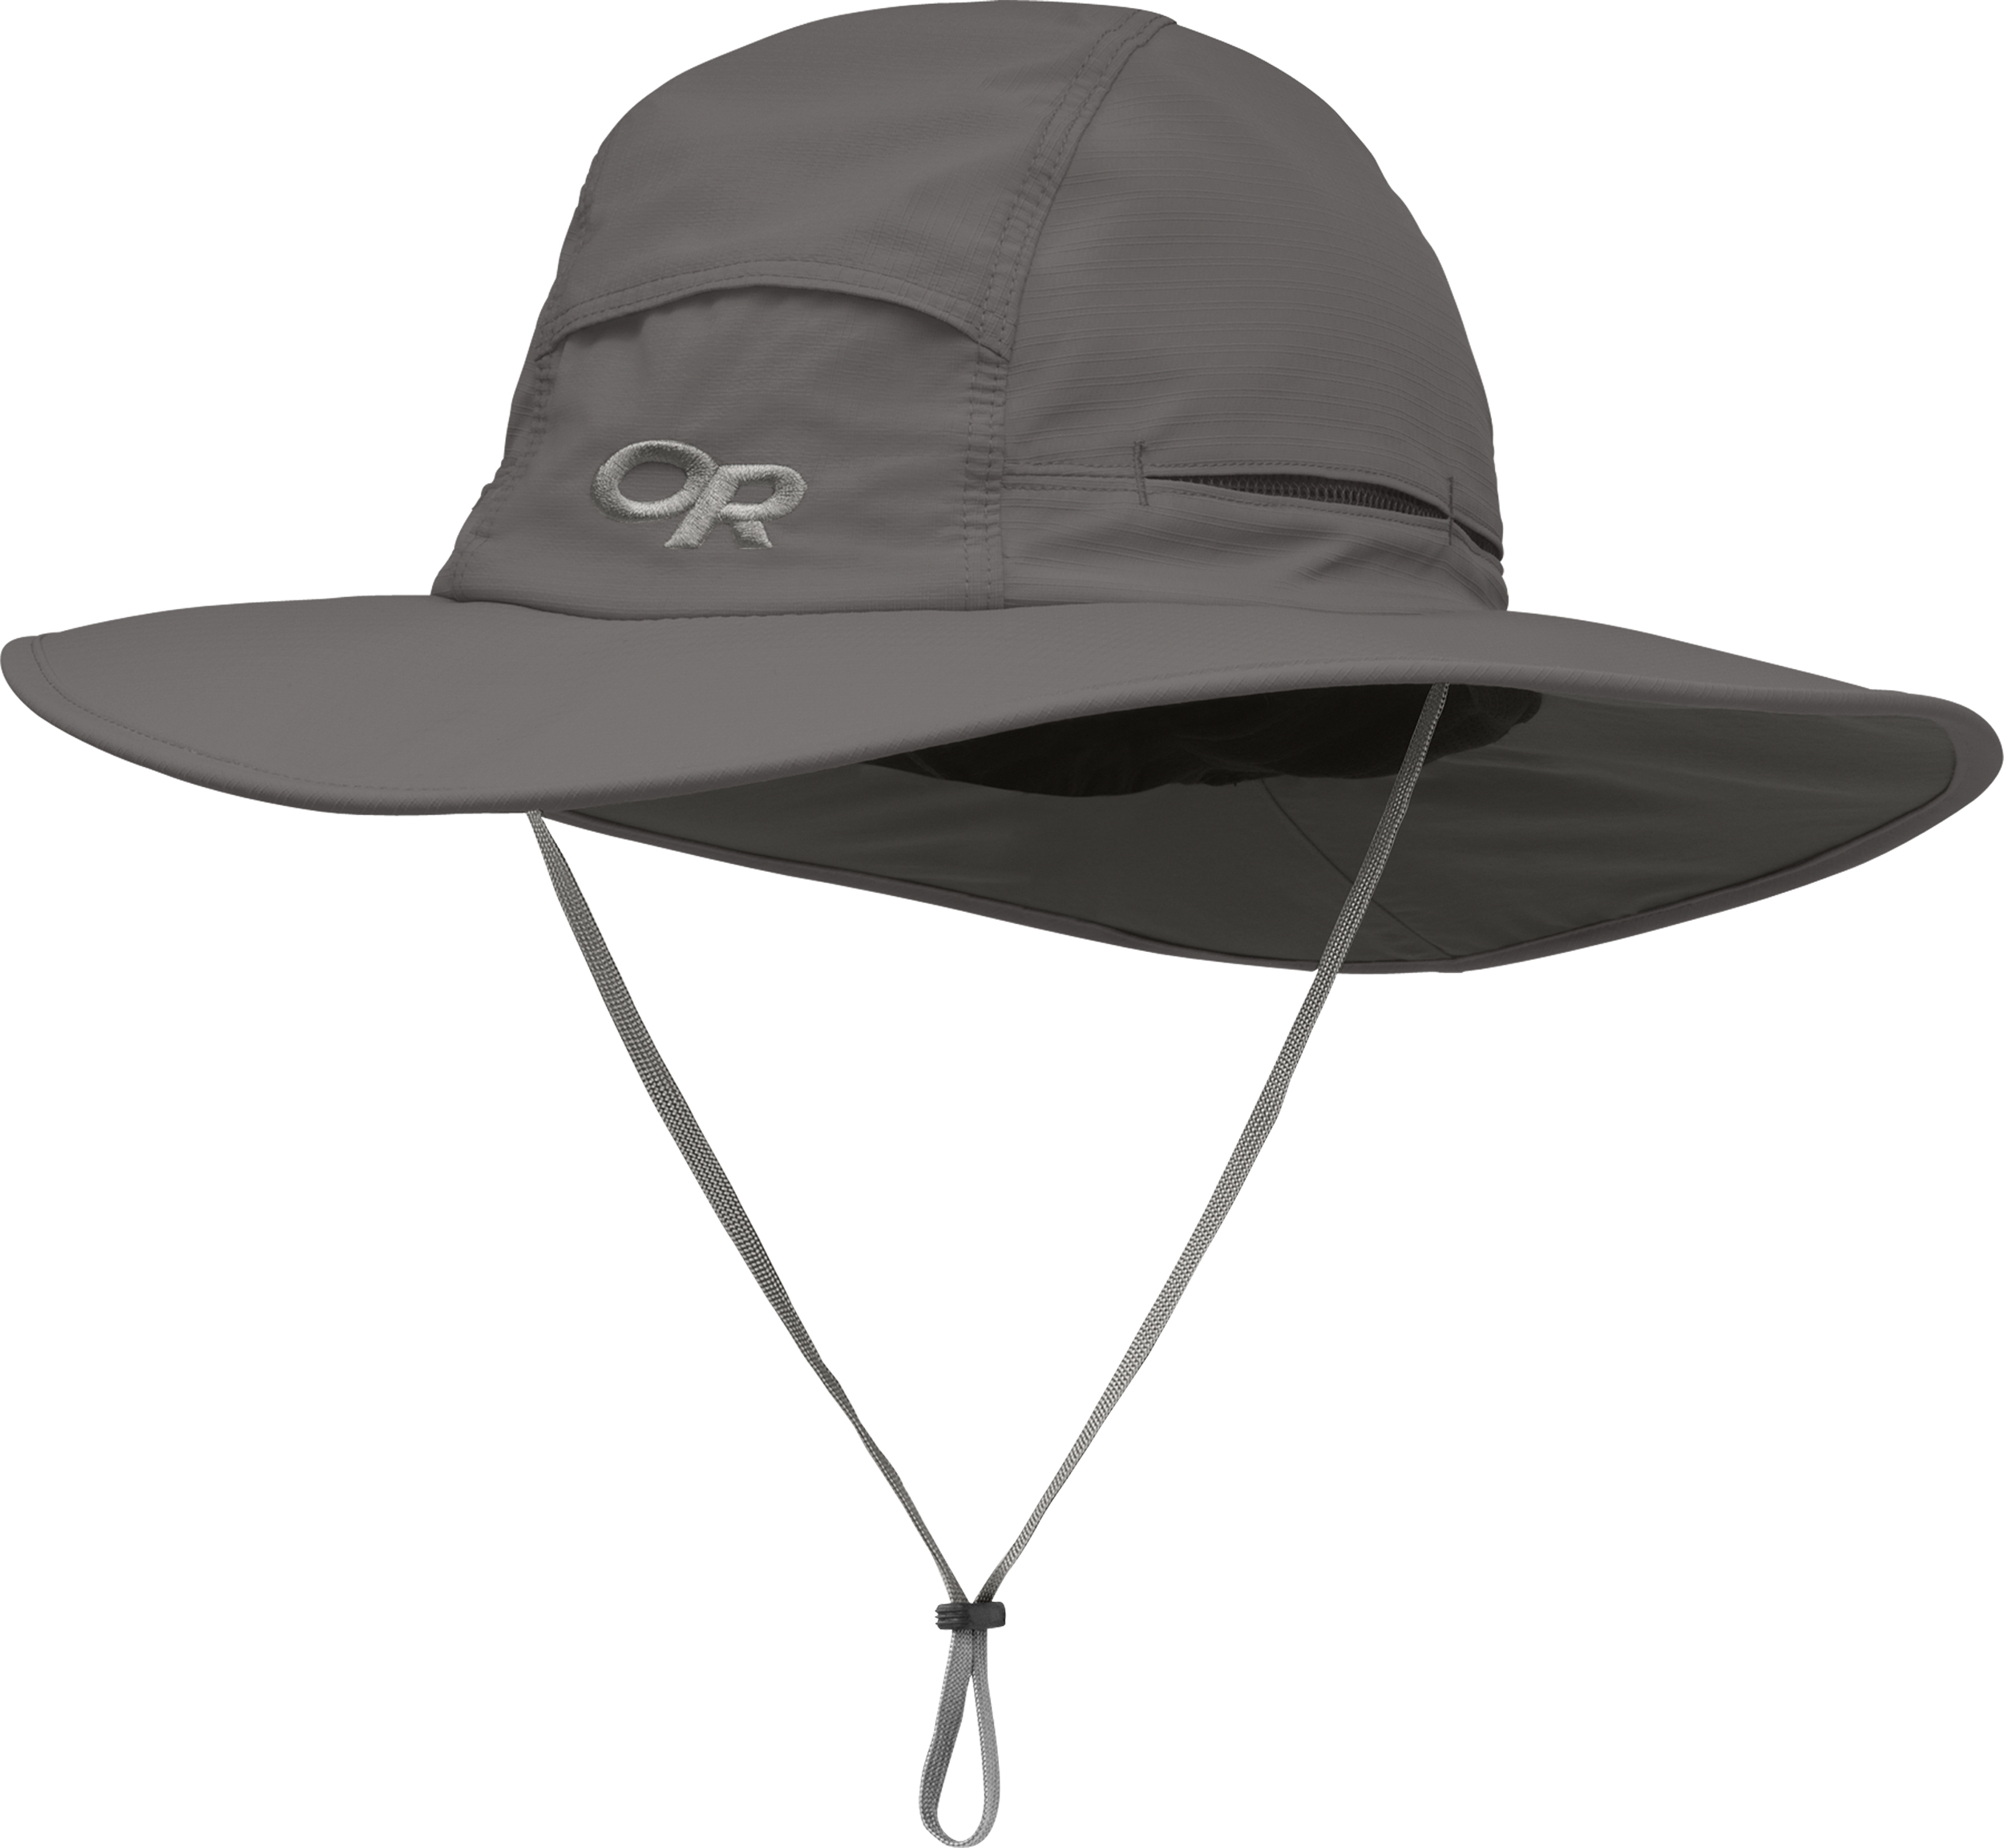 Outdoor Research Chapeau Sun Bucket